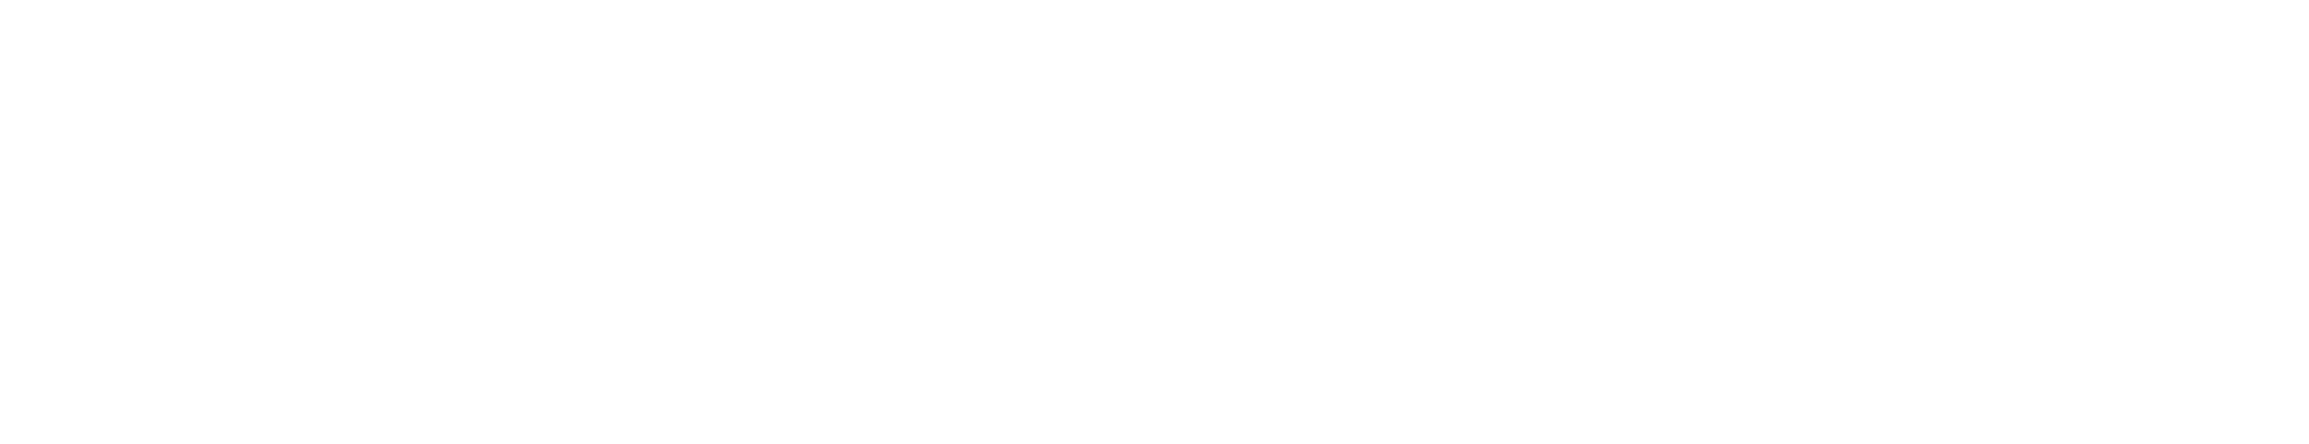 Edda Bunader